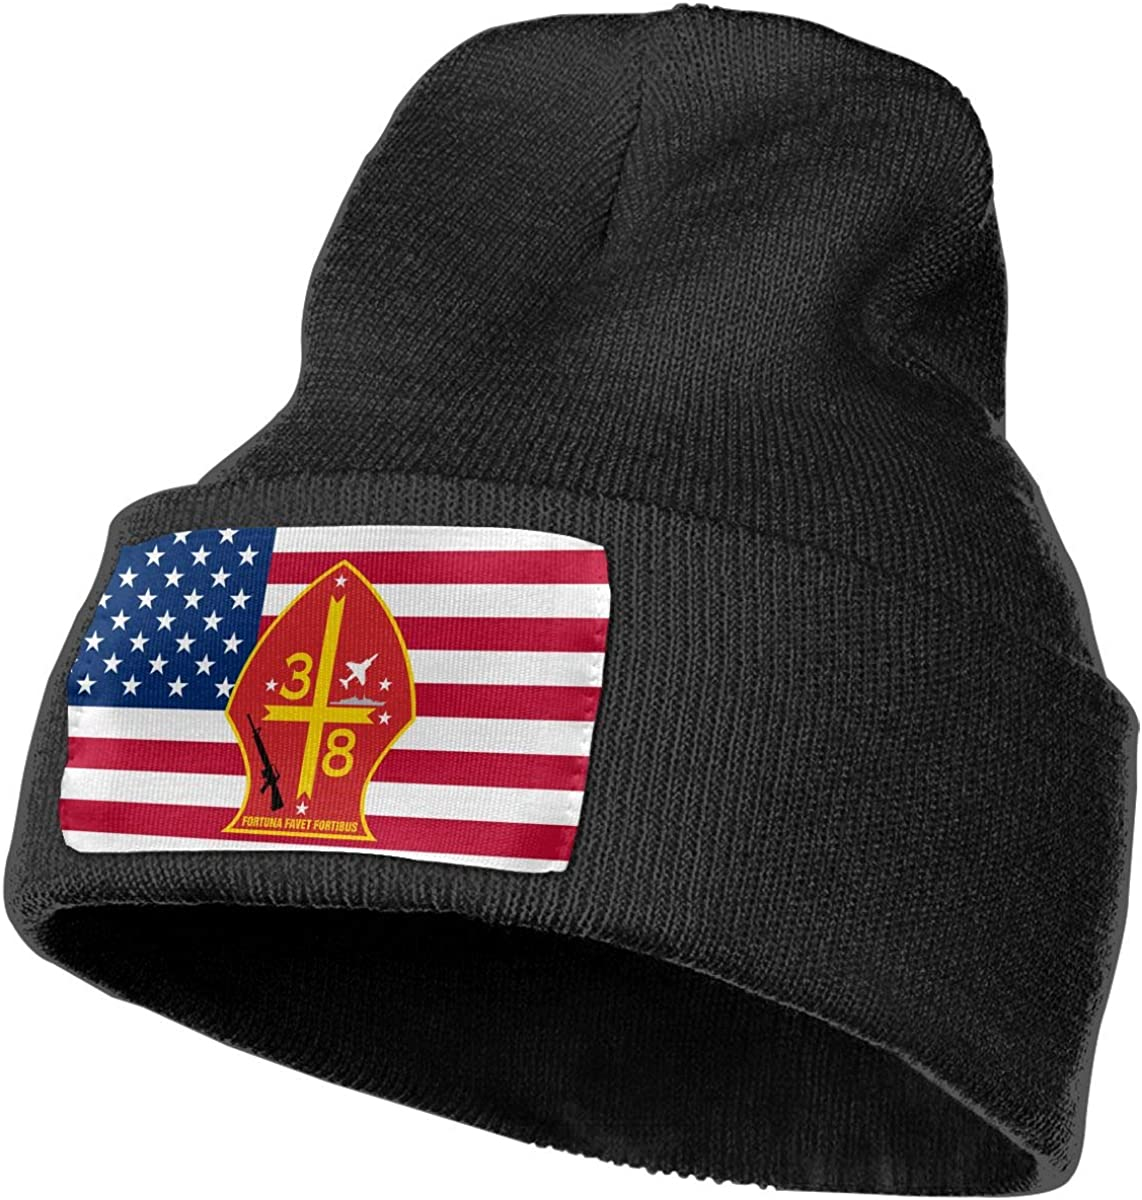 3rd Battalion 8th Marine Regiment Men/&Women Warm Winter Knit Plain Beanie Hat Skull Cap Acrylic Knit Cuff Hat